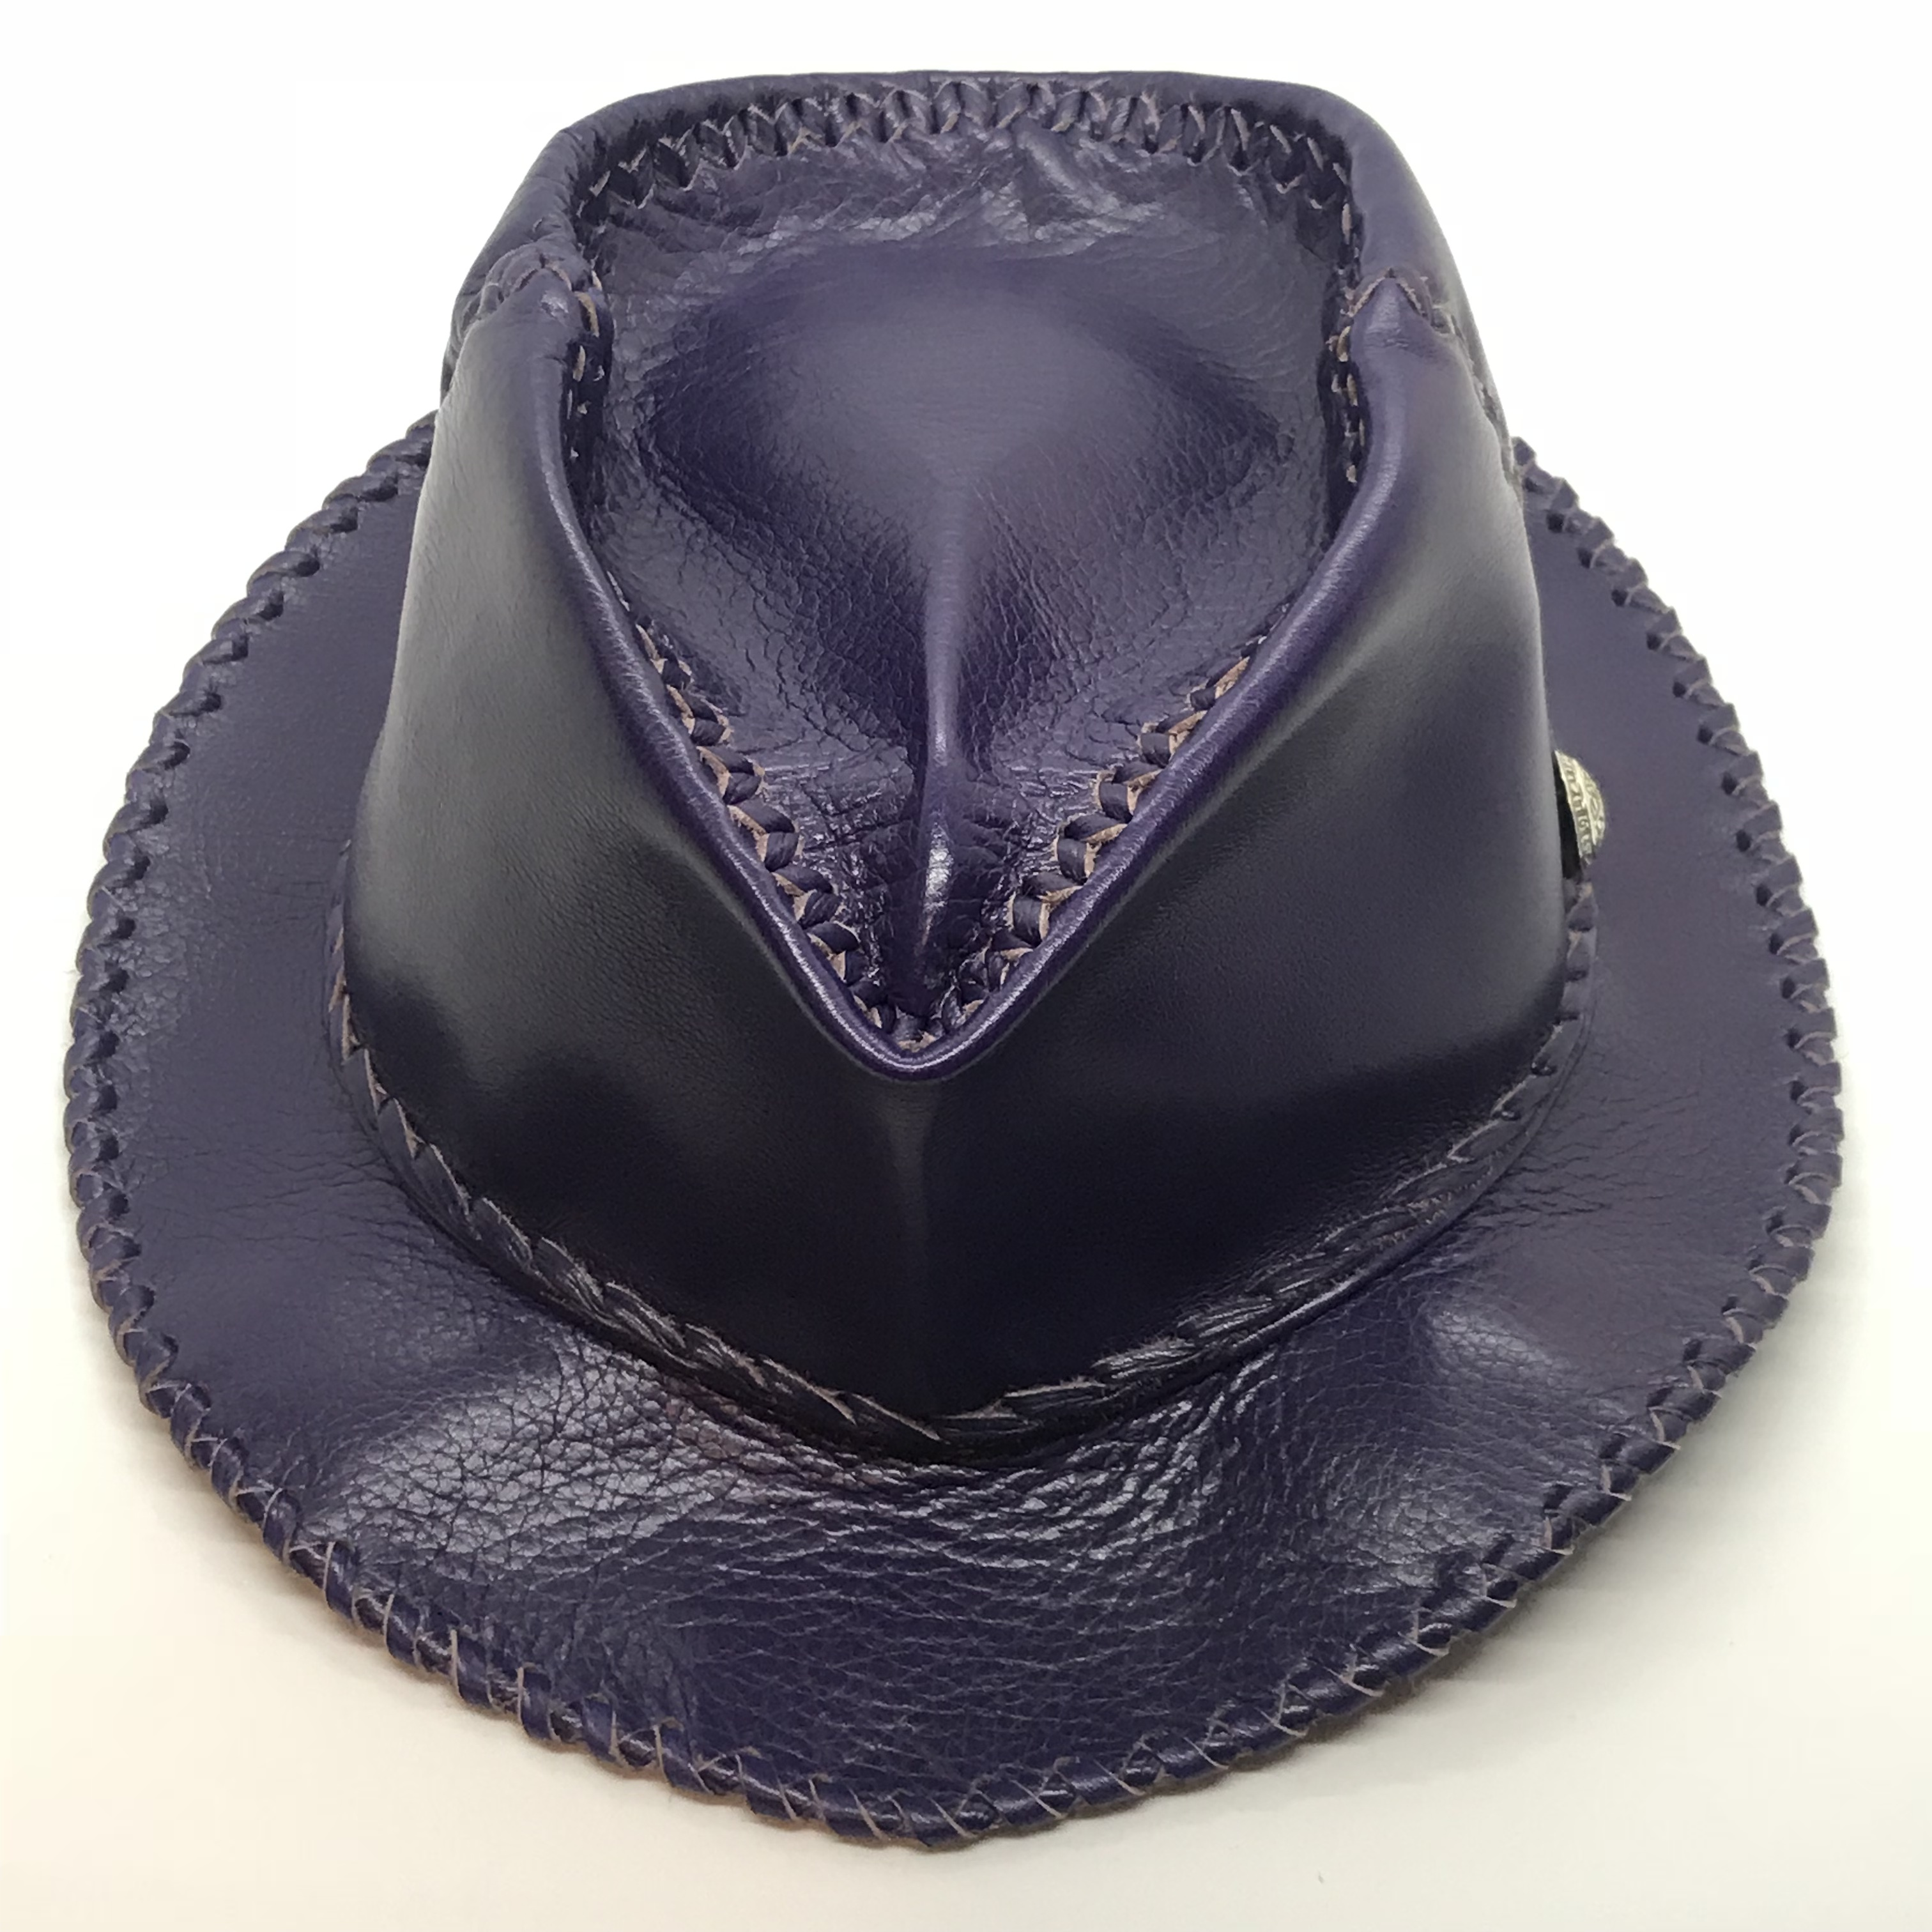 Premium-Bal-Hat-Neo パープル・ヘイズ Mサイズ・1個限定(シルバーコンチョ付)